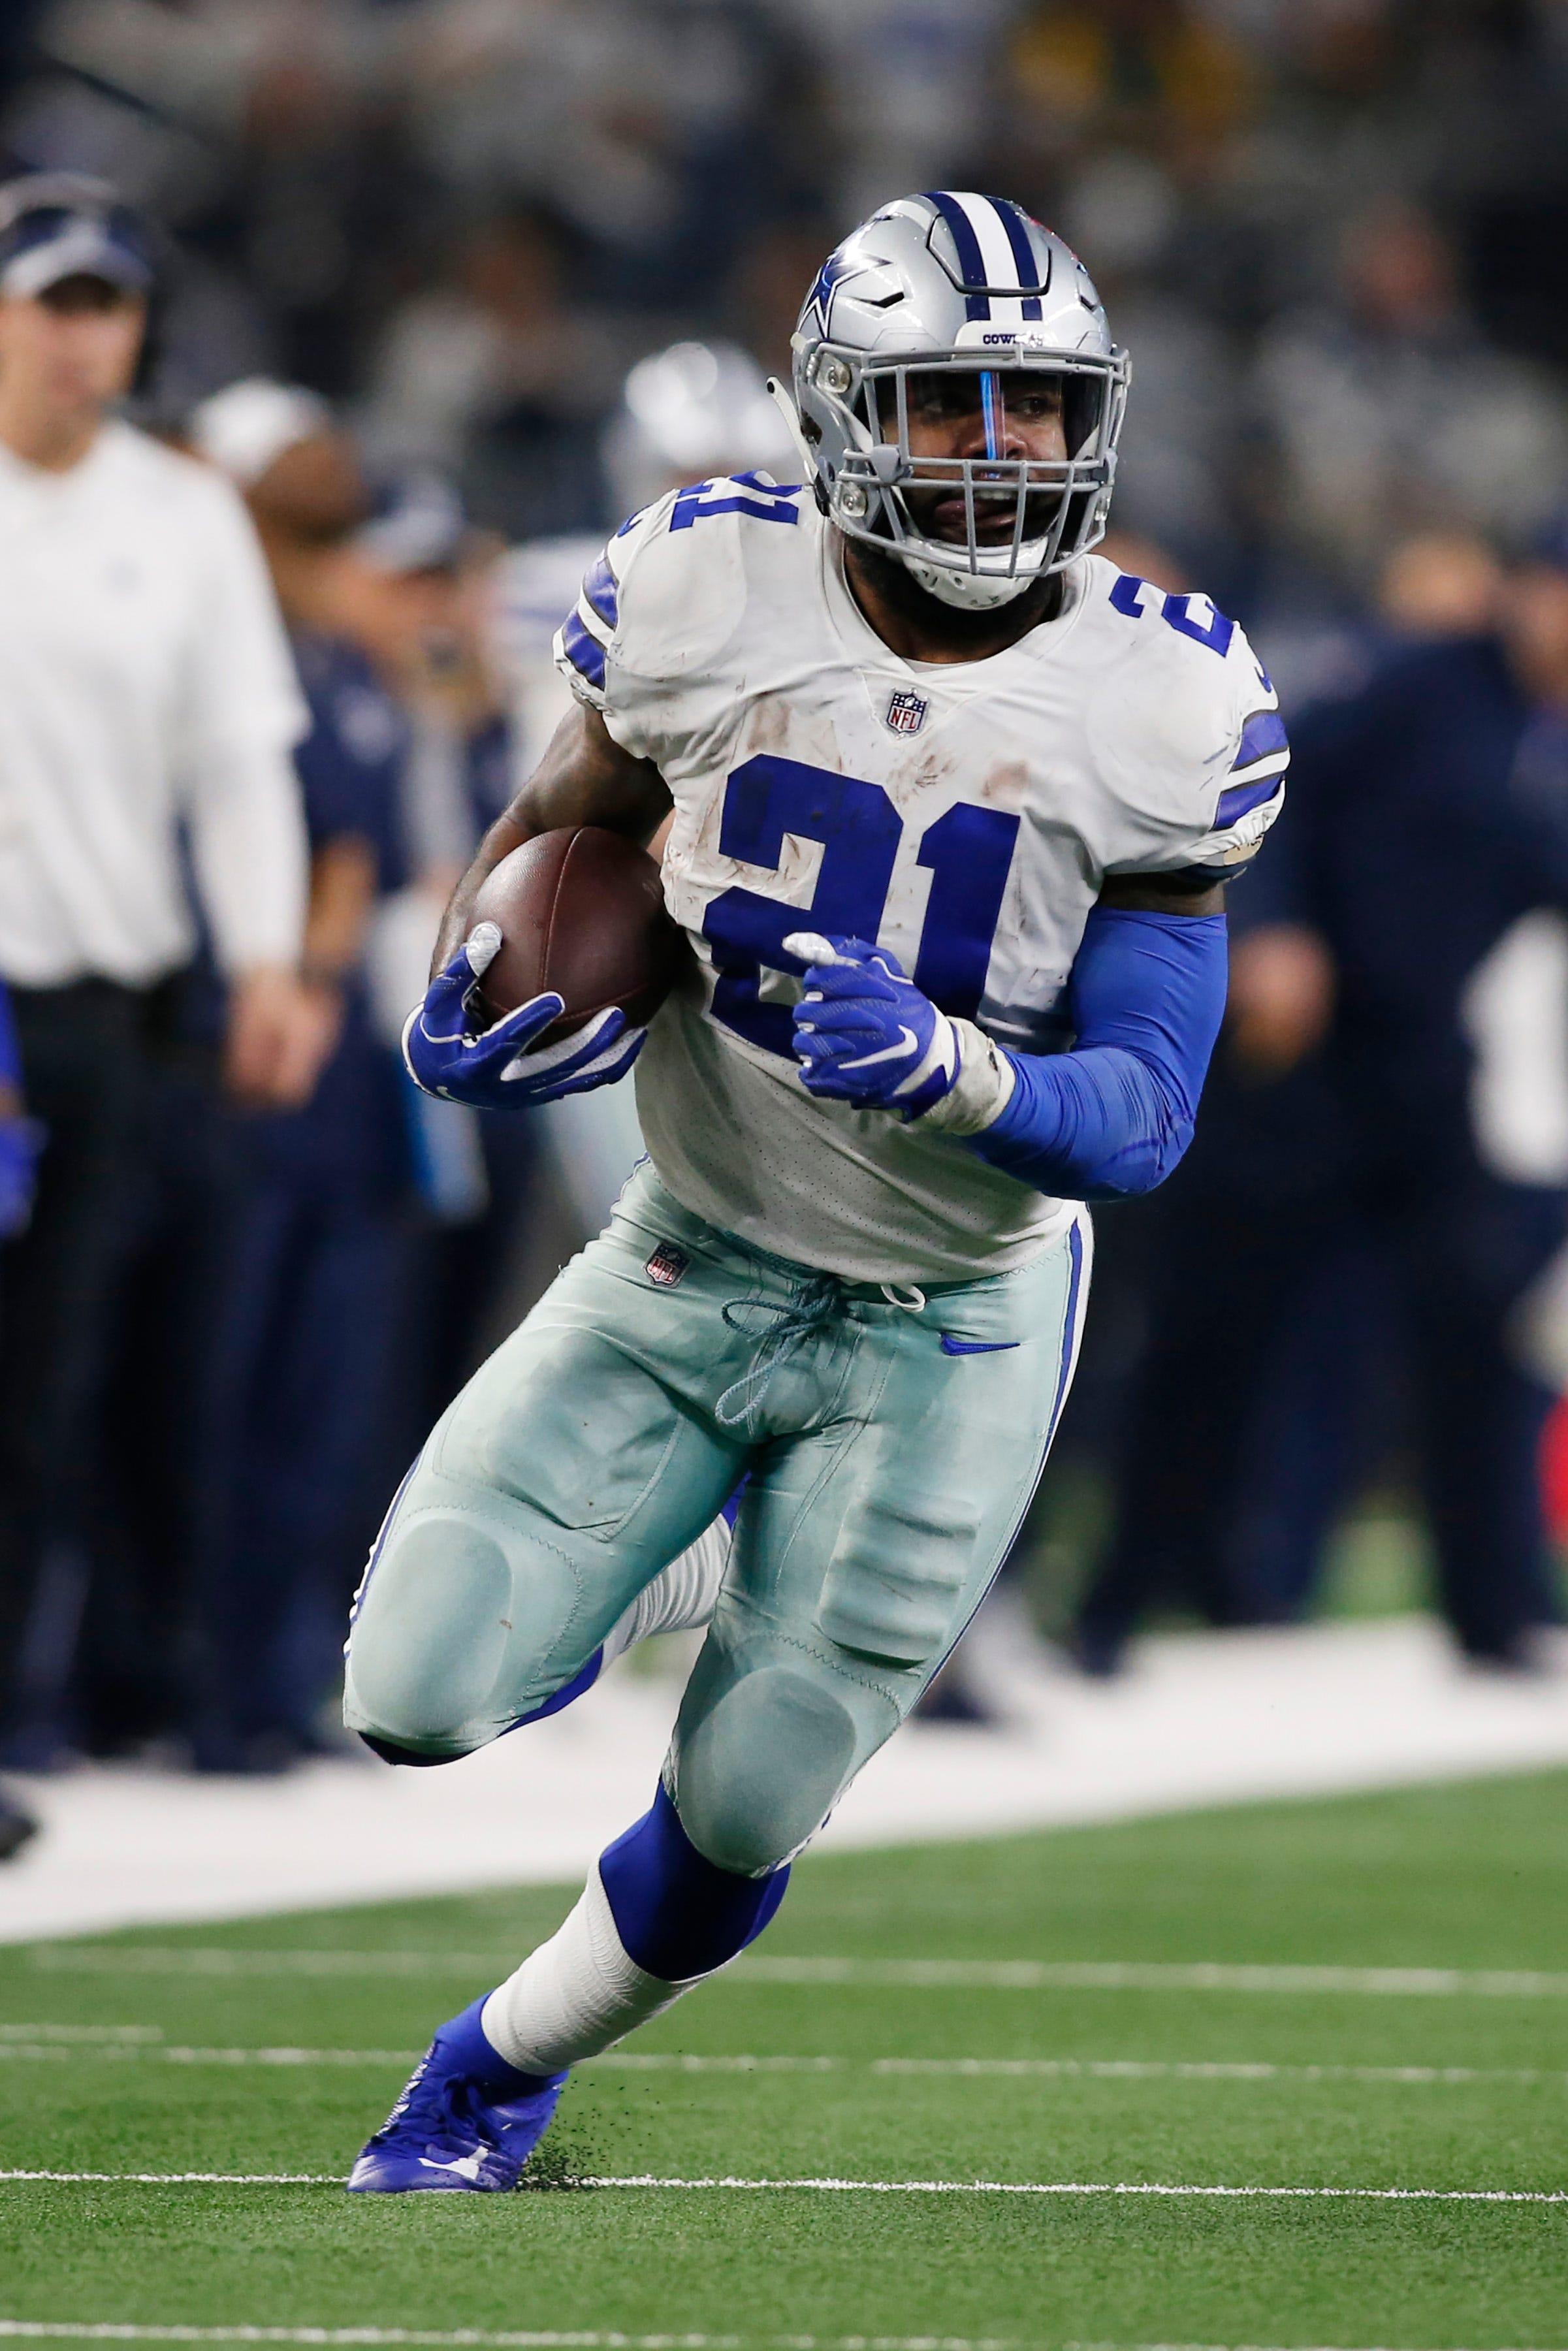 Jerry Jones not rushing Ezekiel Elliott back, wants Cowboys star fresh for playoffs